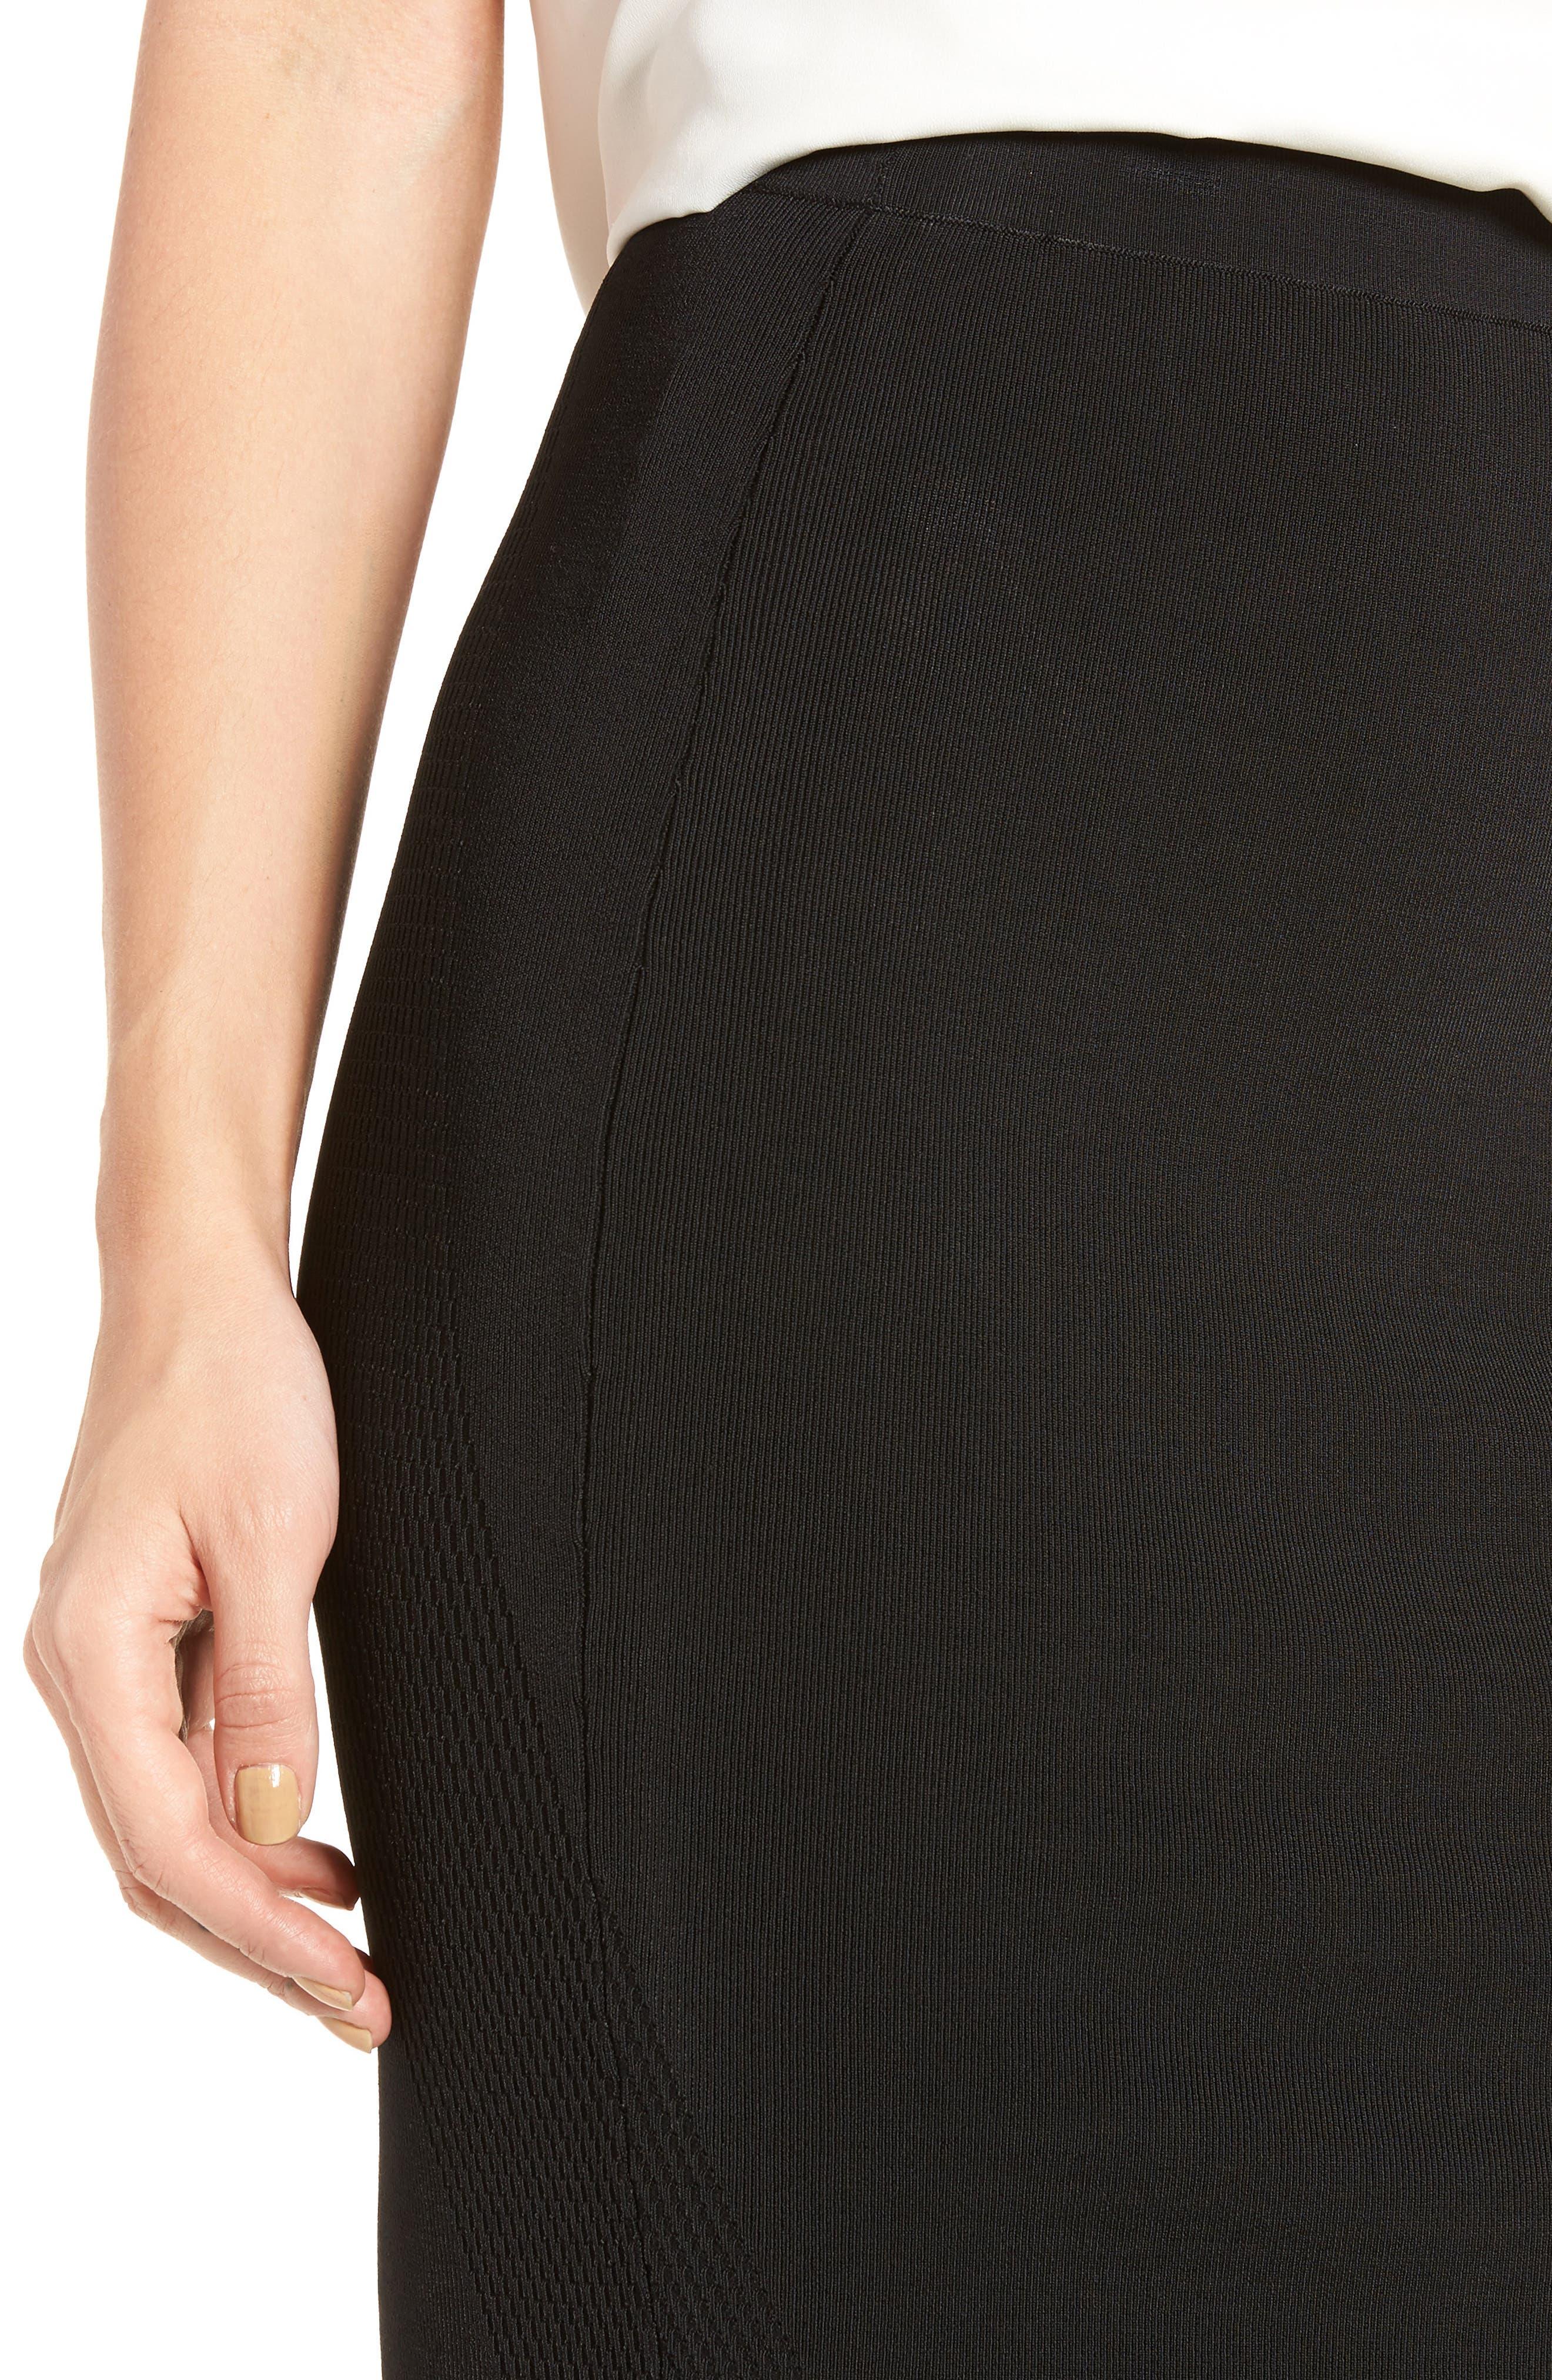 Sweater Pencil Skirt,                             Alternate thumbnail 4, color,                             001